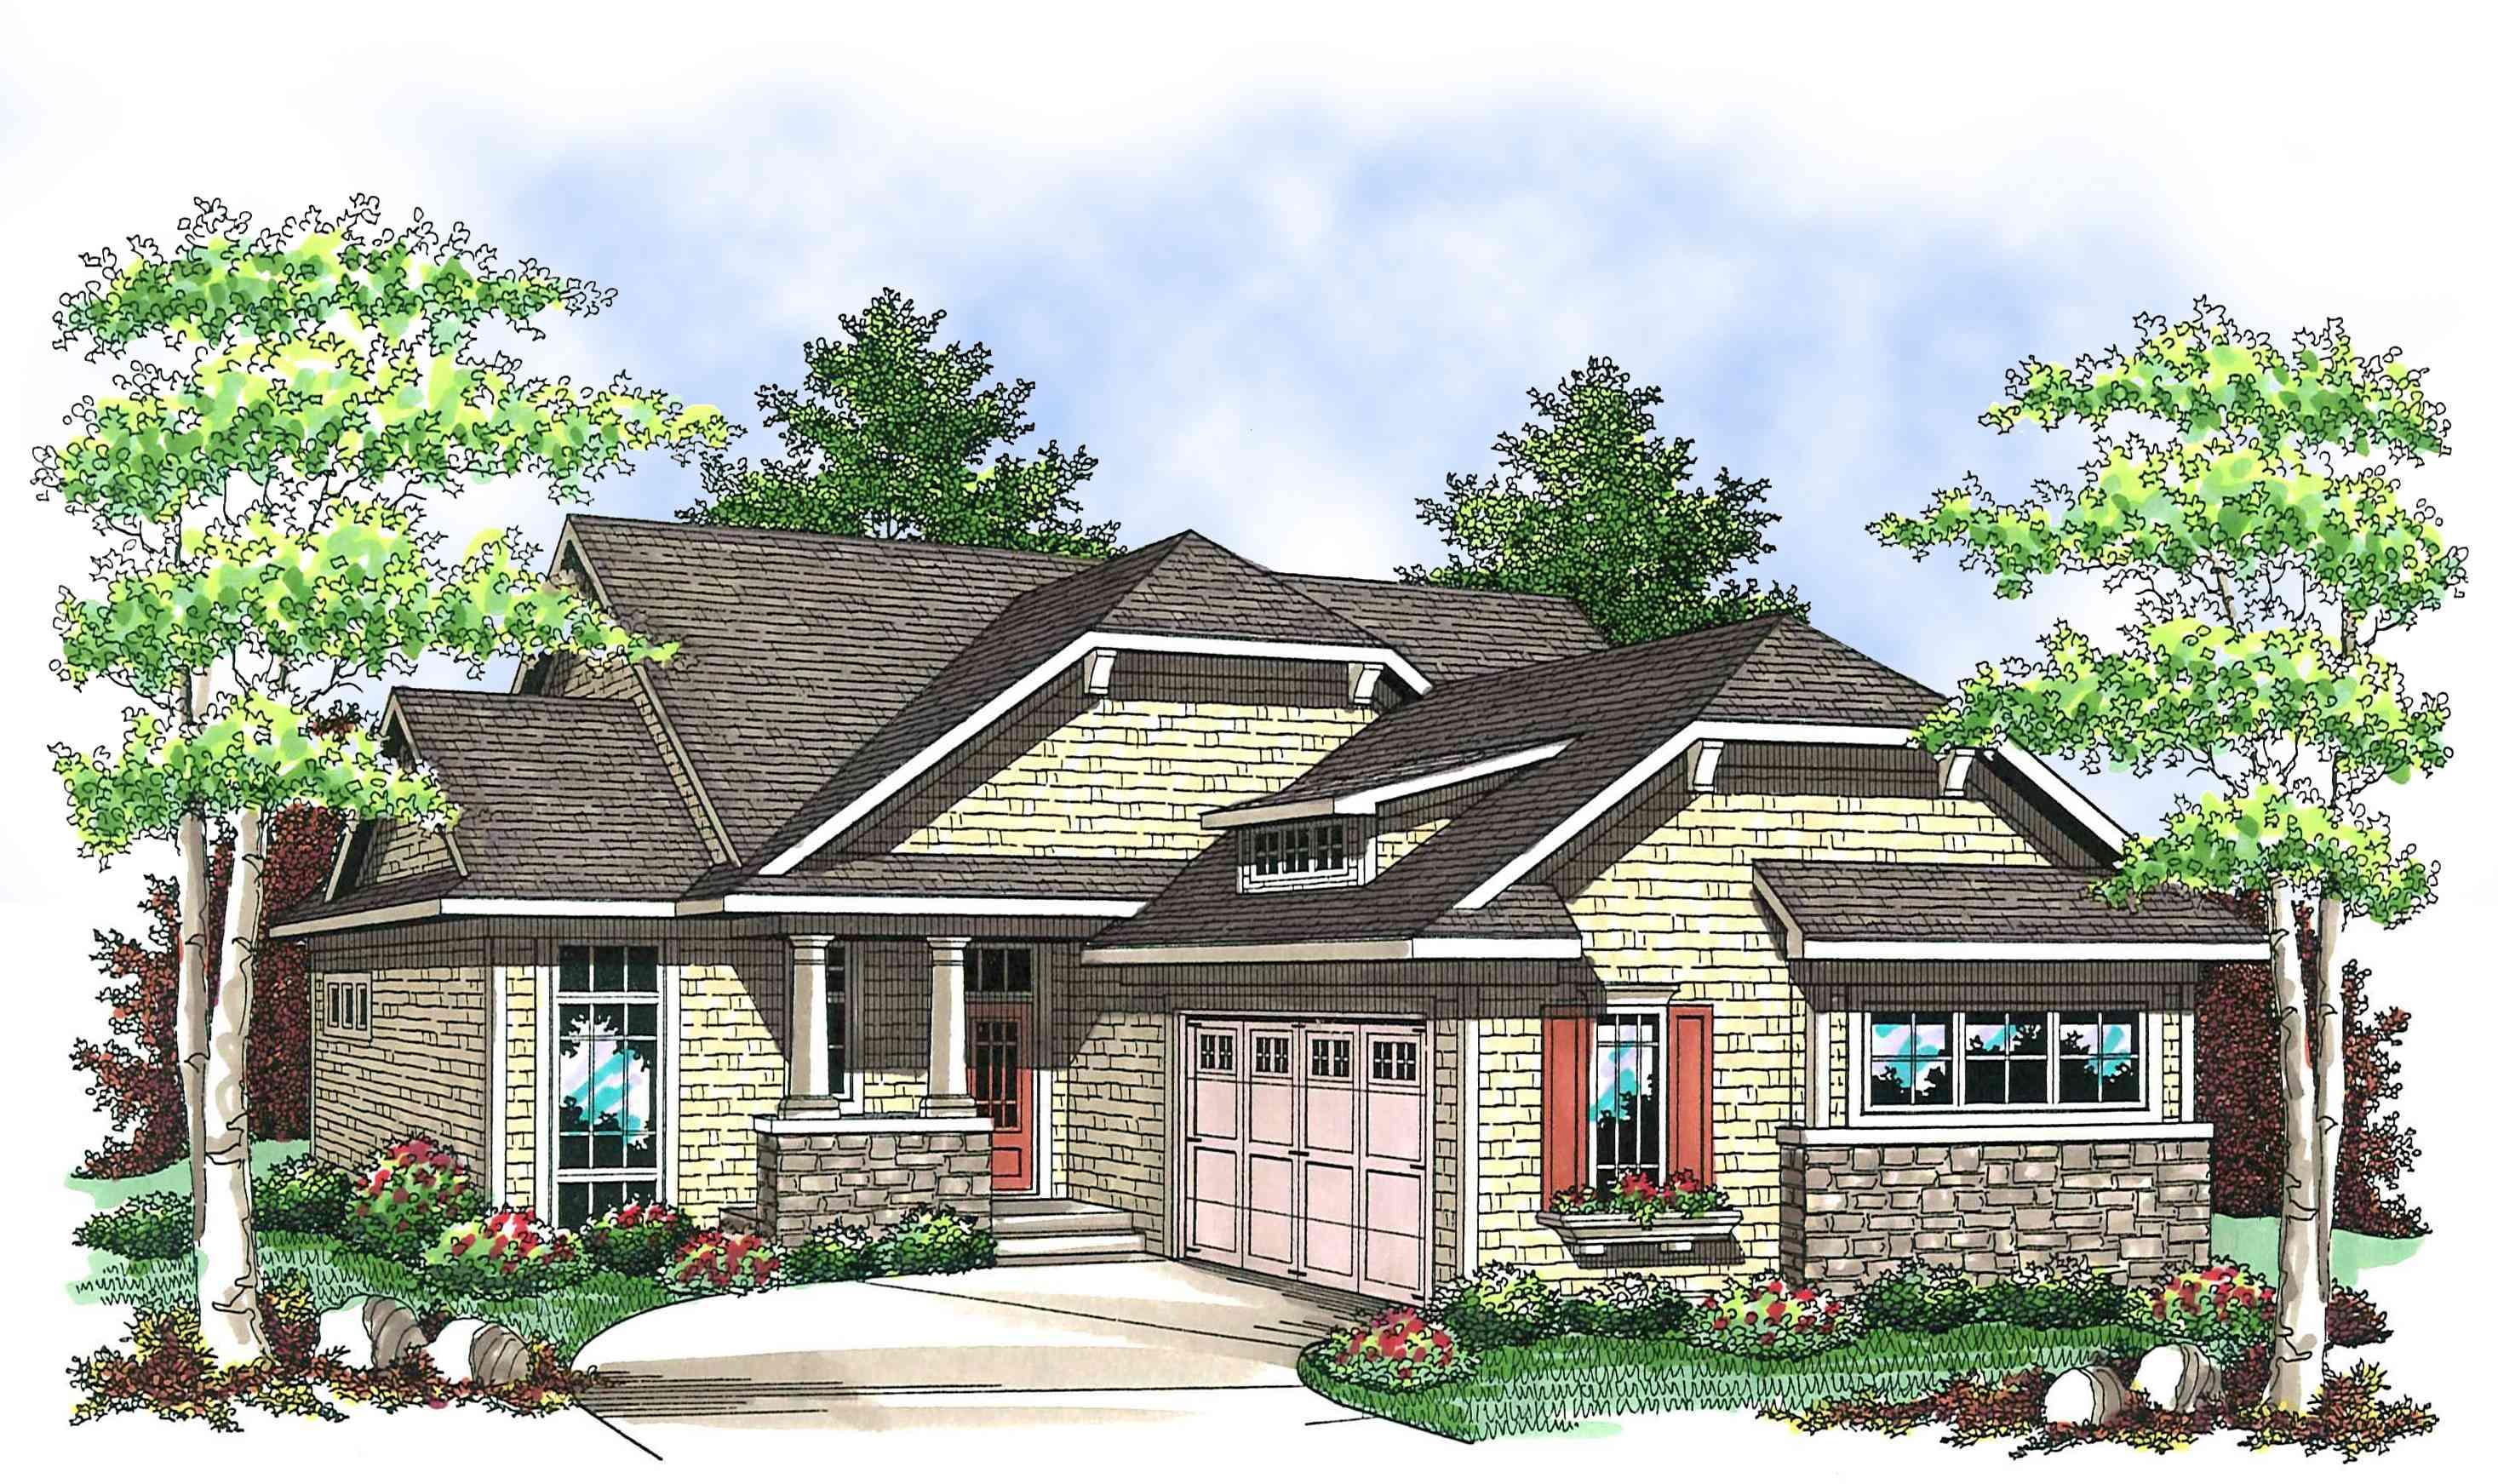 True craftsman charmer 89656ah architectural designs for Architectural designs com